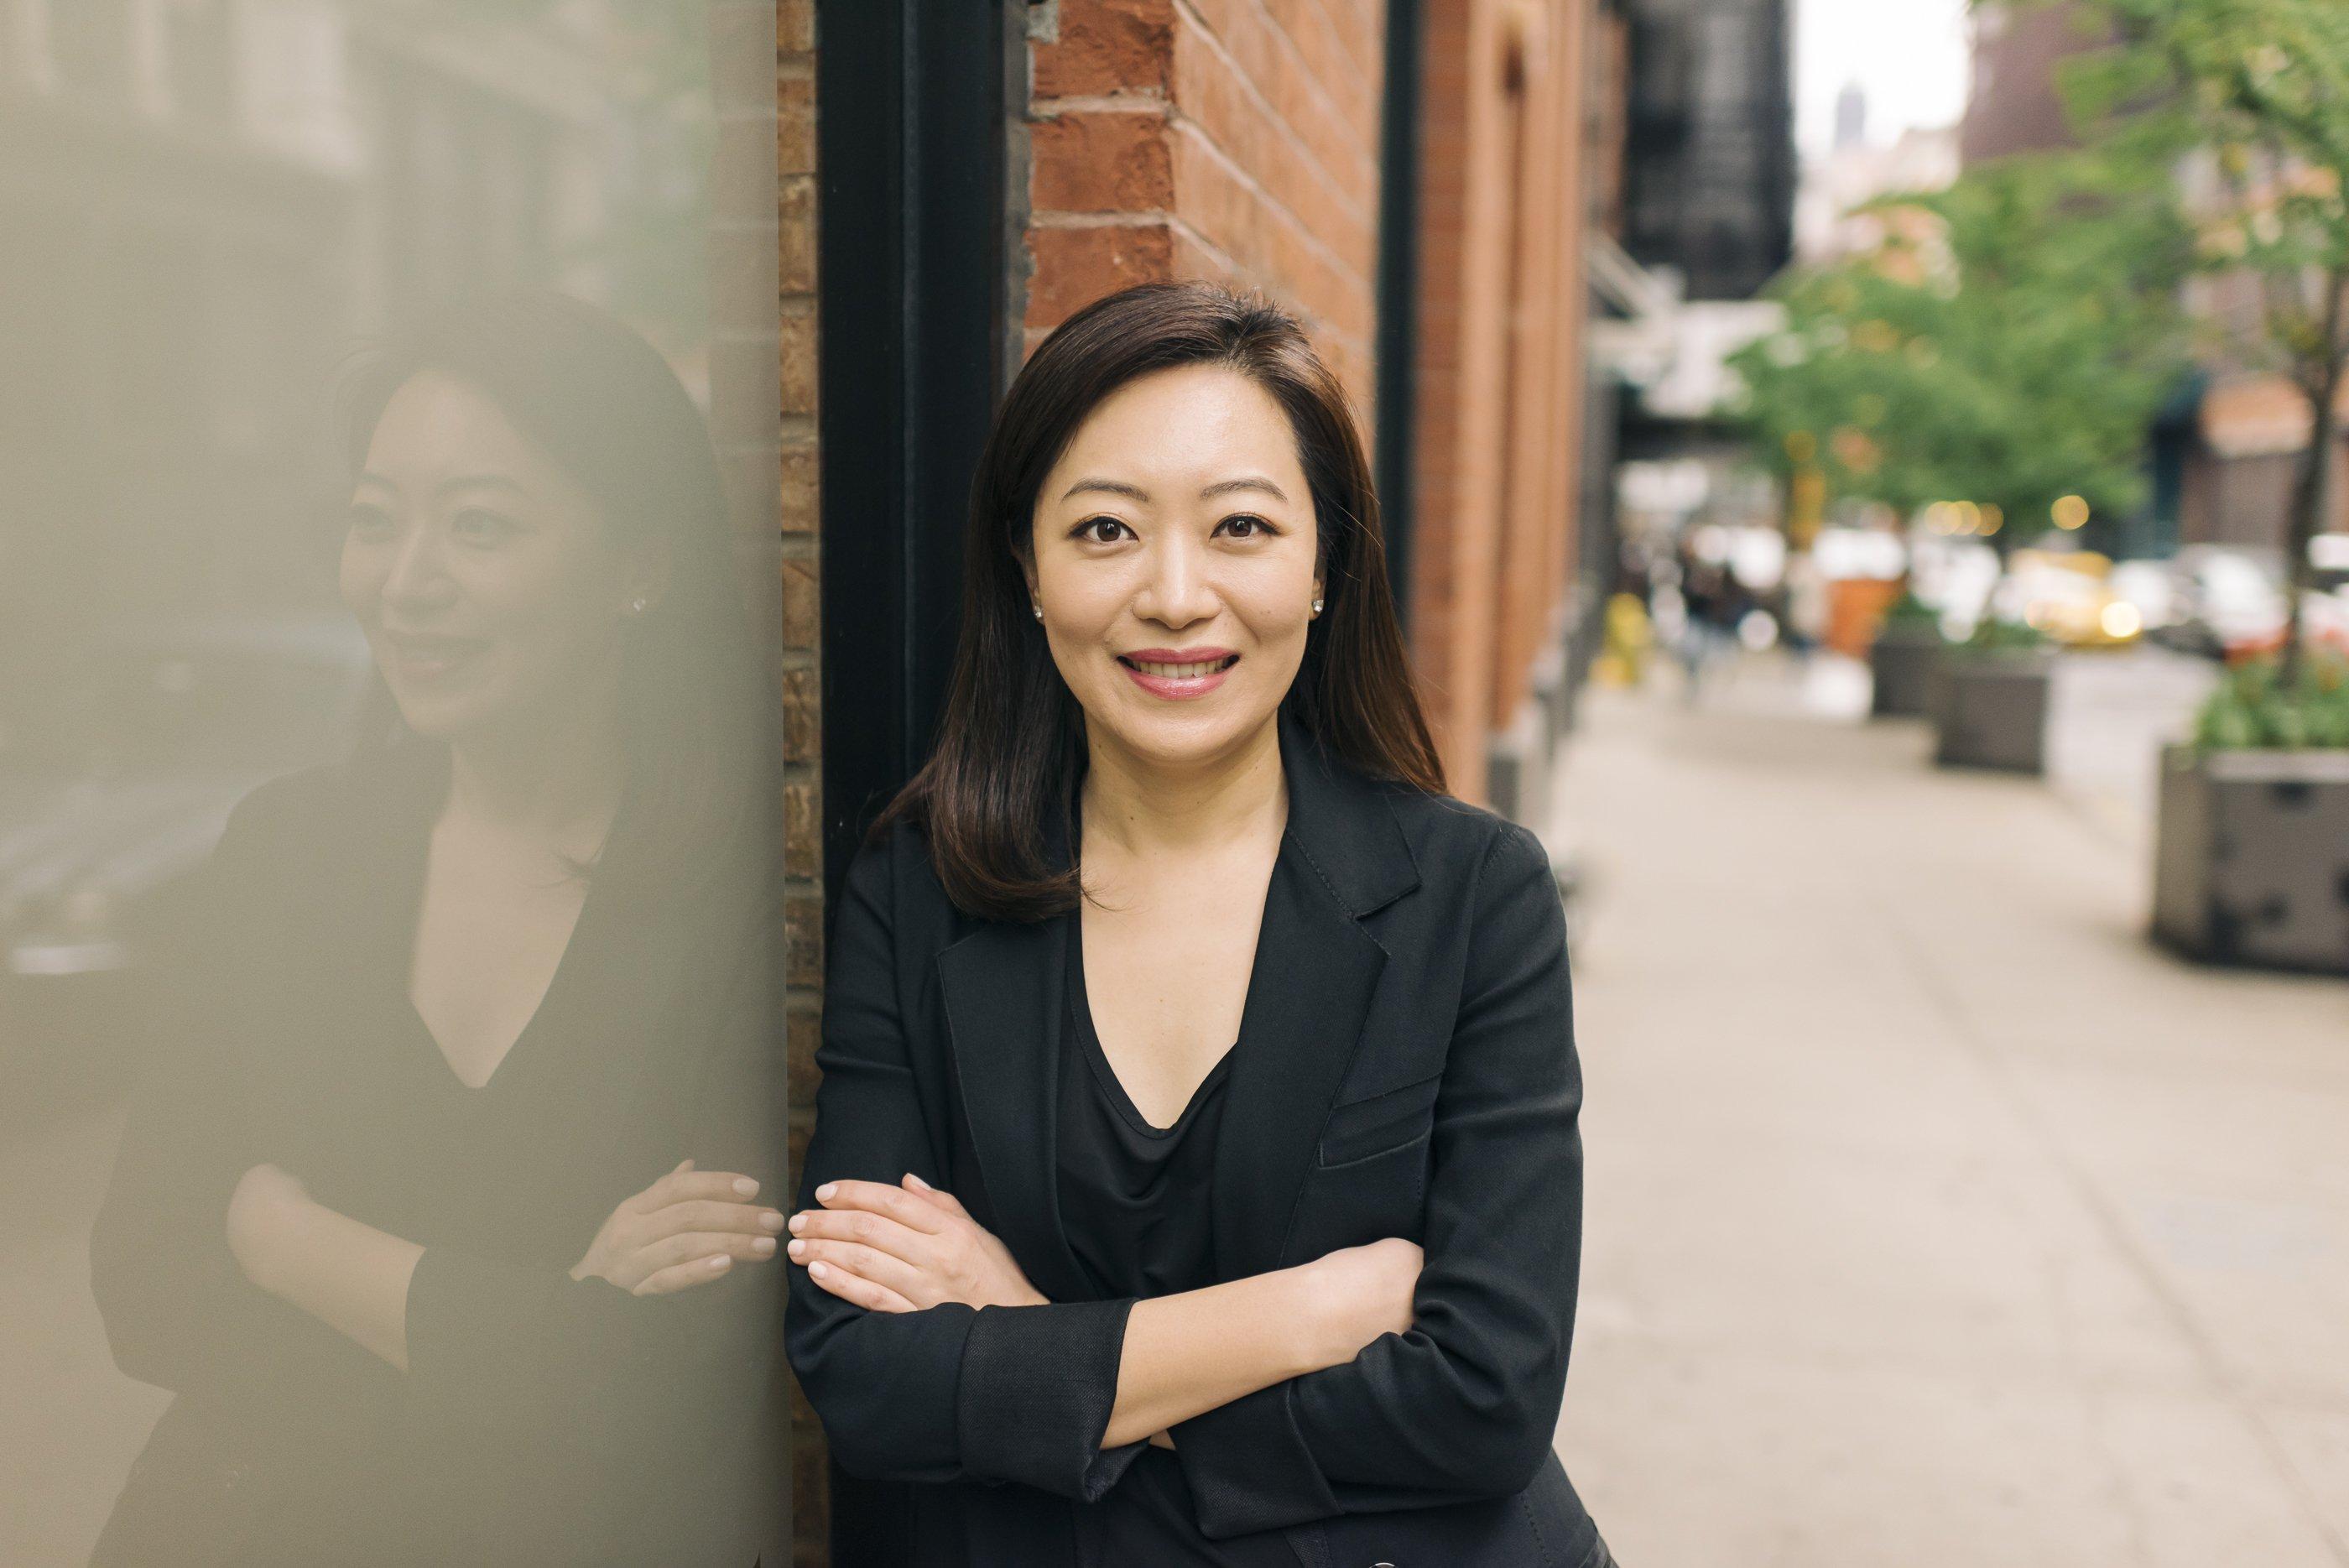 Hero Cosmetics founder and CEO Ju Rhyu